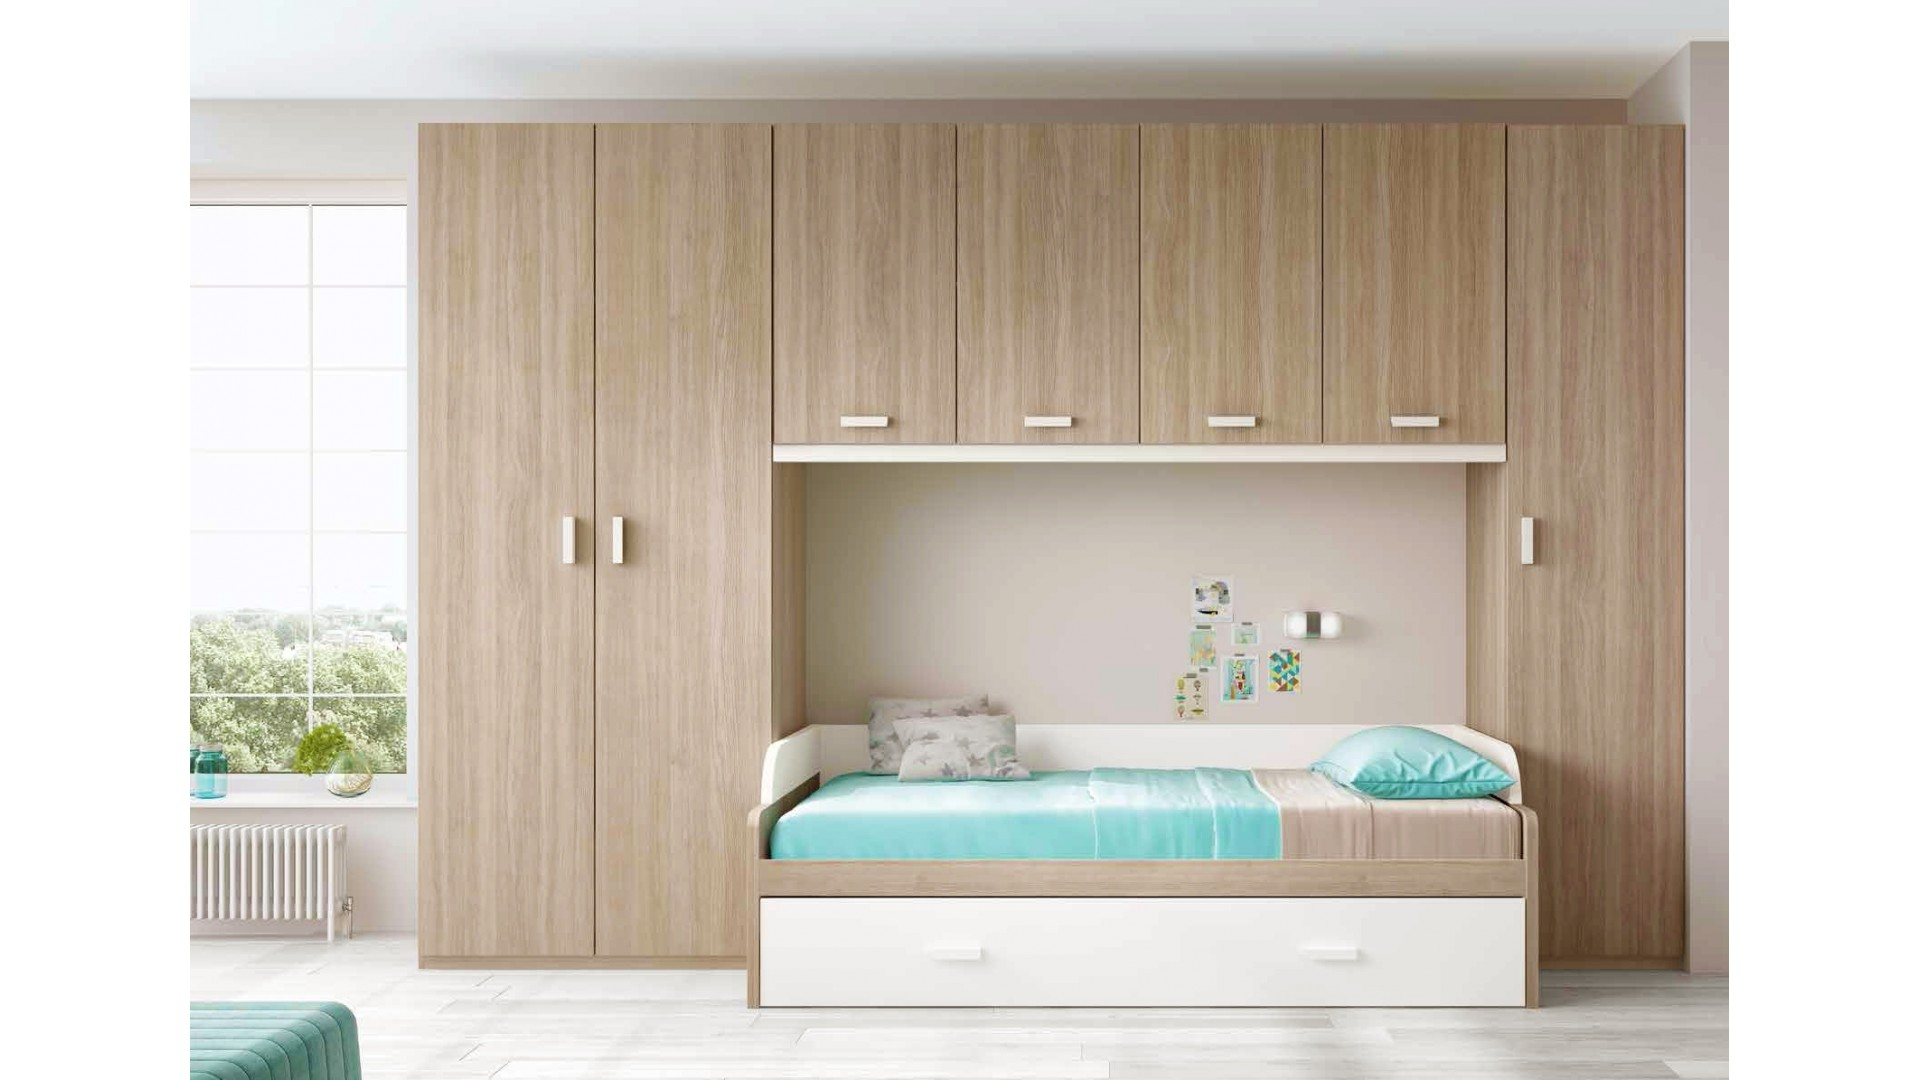 Chambre pour ado composition L114 avec lit gigogne - GLICERIO